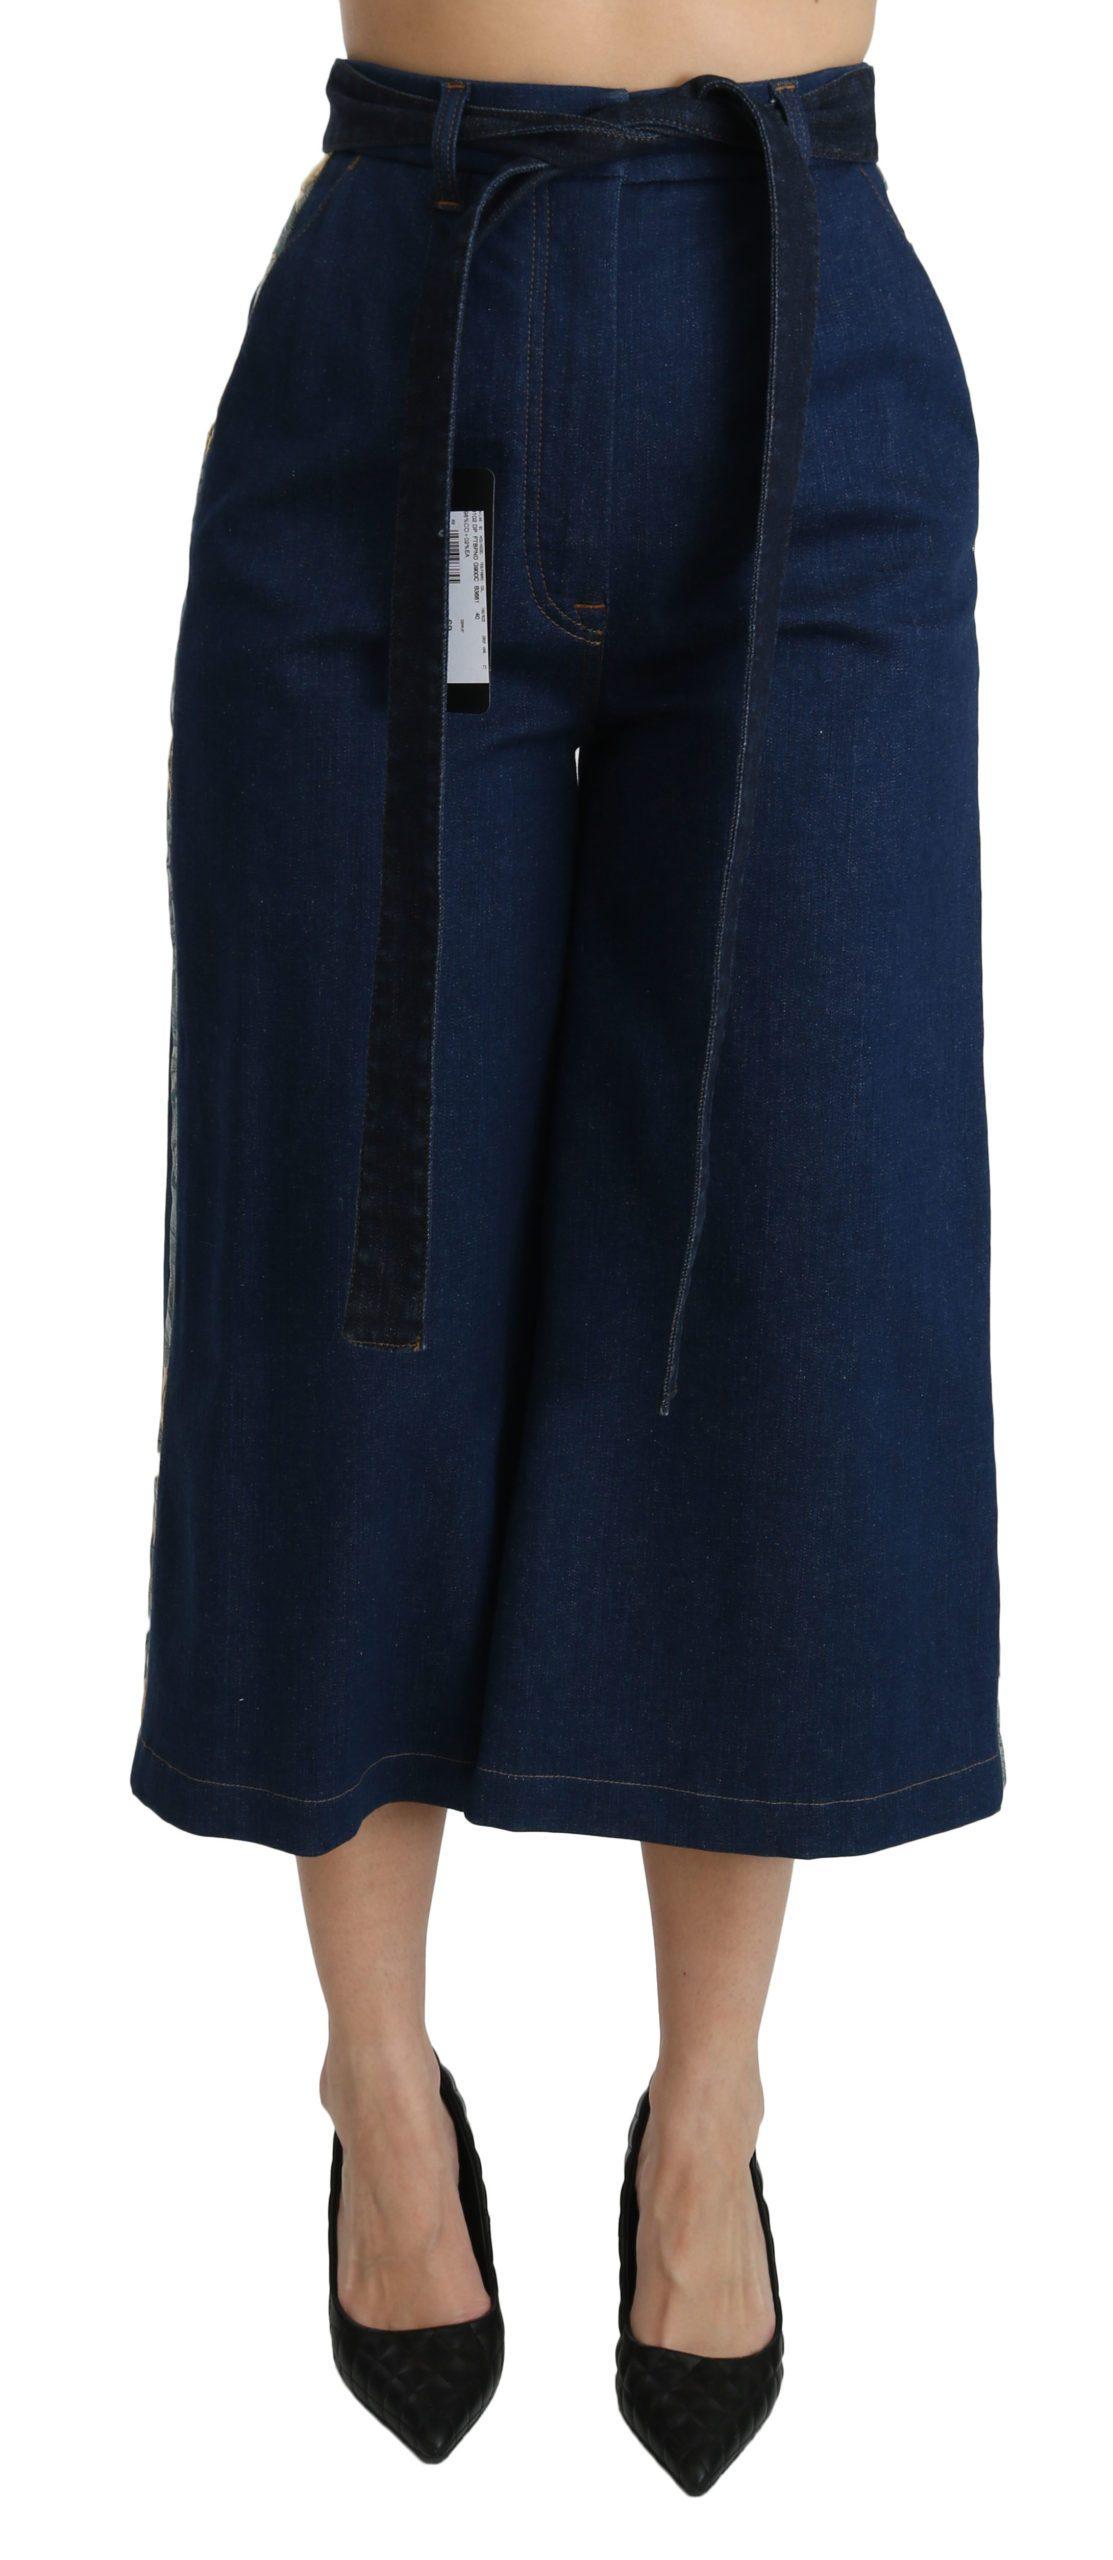 Dolce & Gabbana Women's Palazzo Cropped Denim Cotton Stretch Jeans Blue PAN70864 - IT40|S